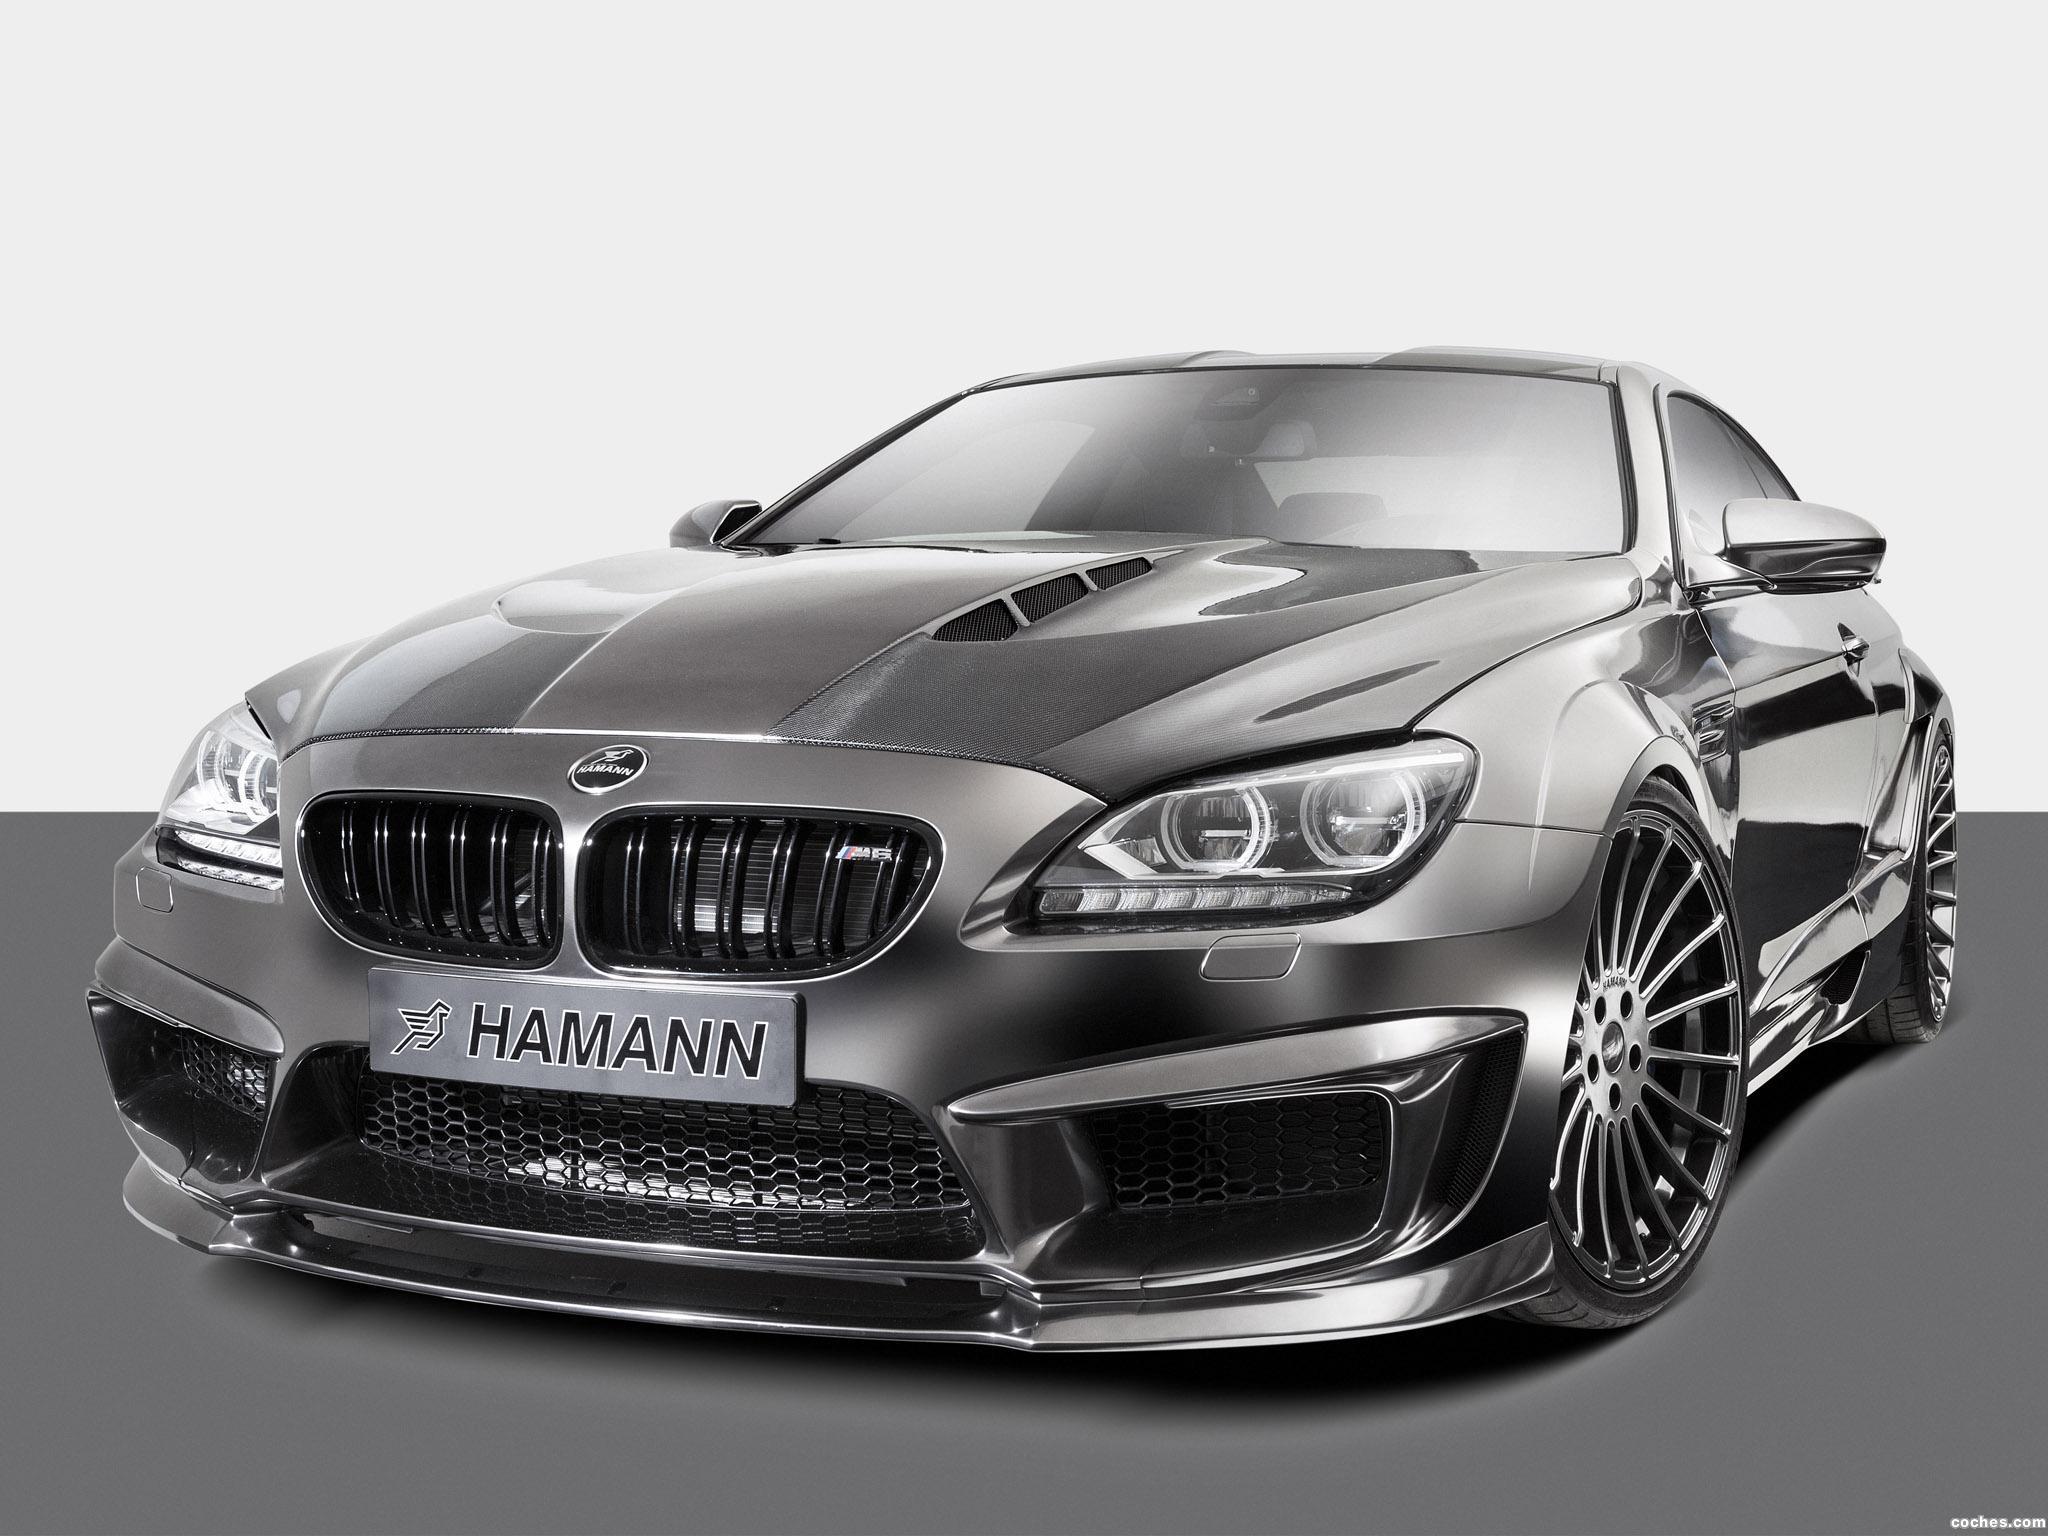 Foto 0 de Hamann BMW M6 Mirr6r F12 2013